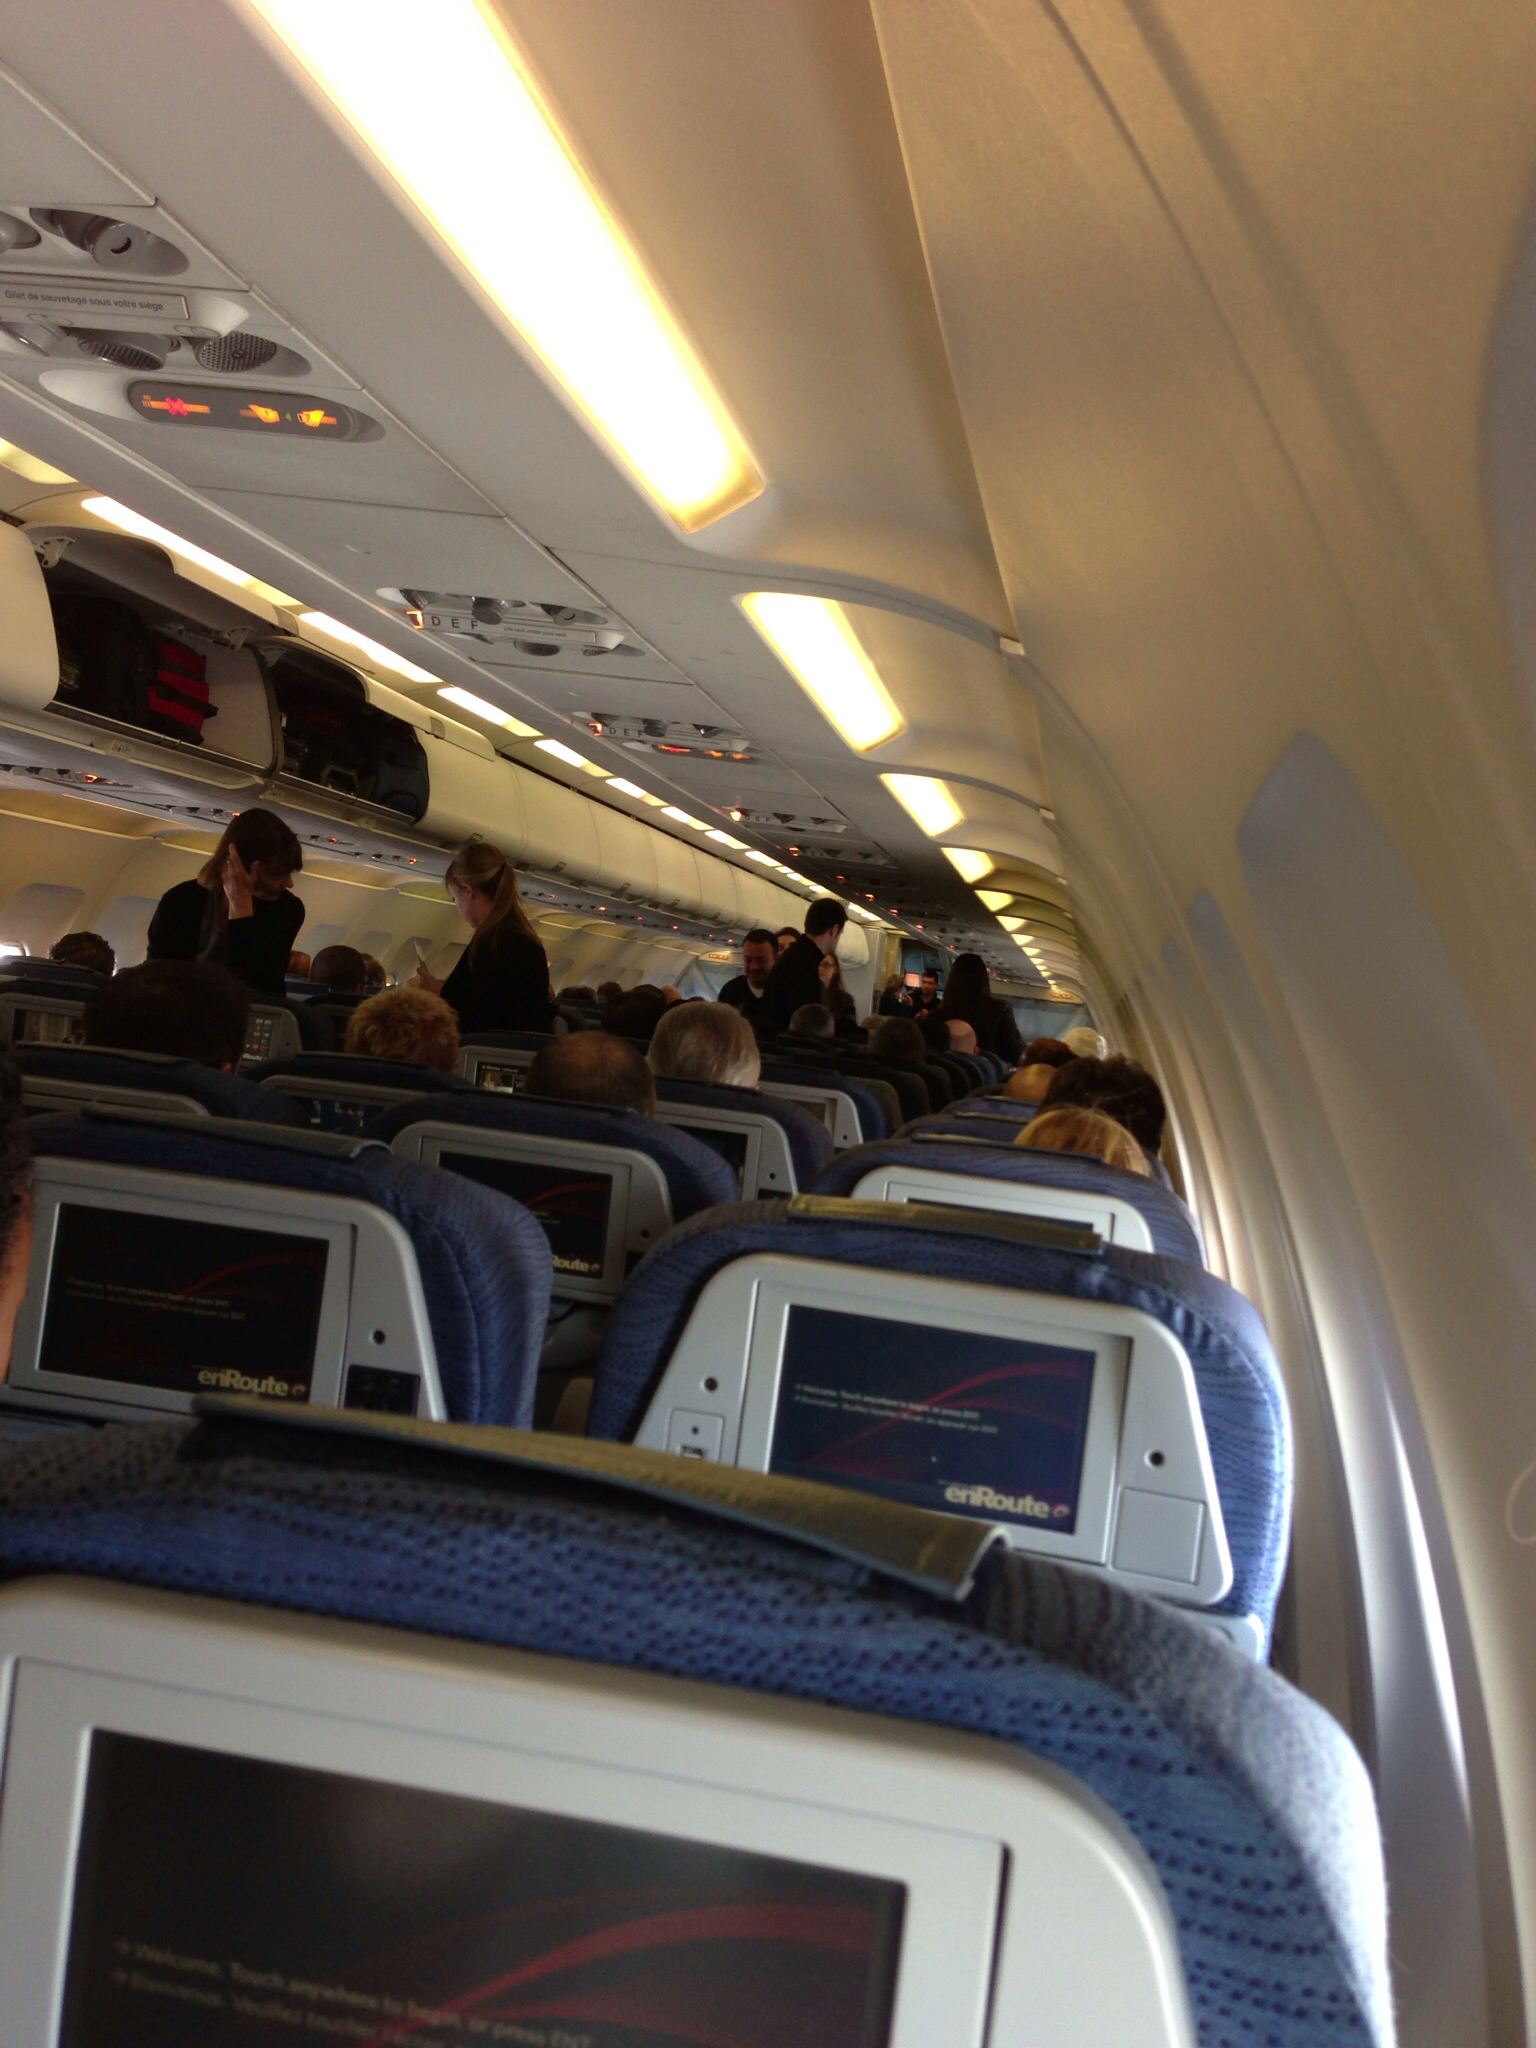 Air Canada flight to Las Vegas